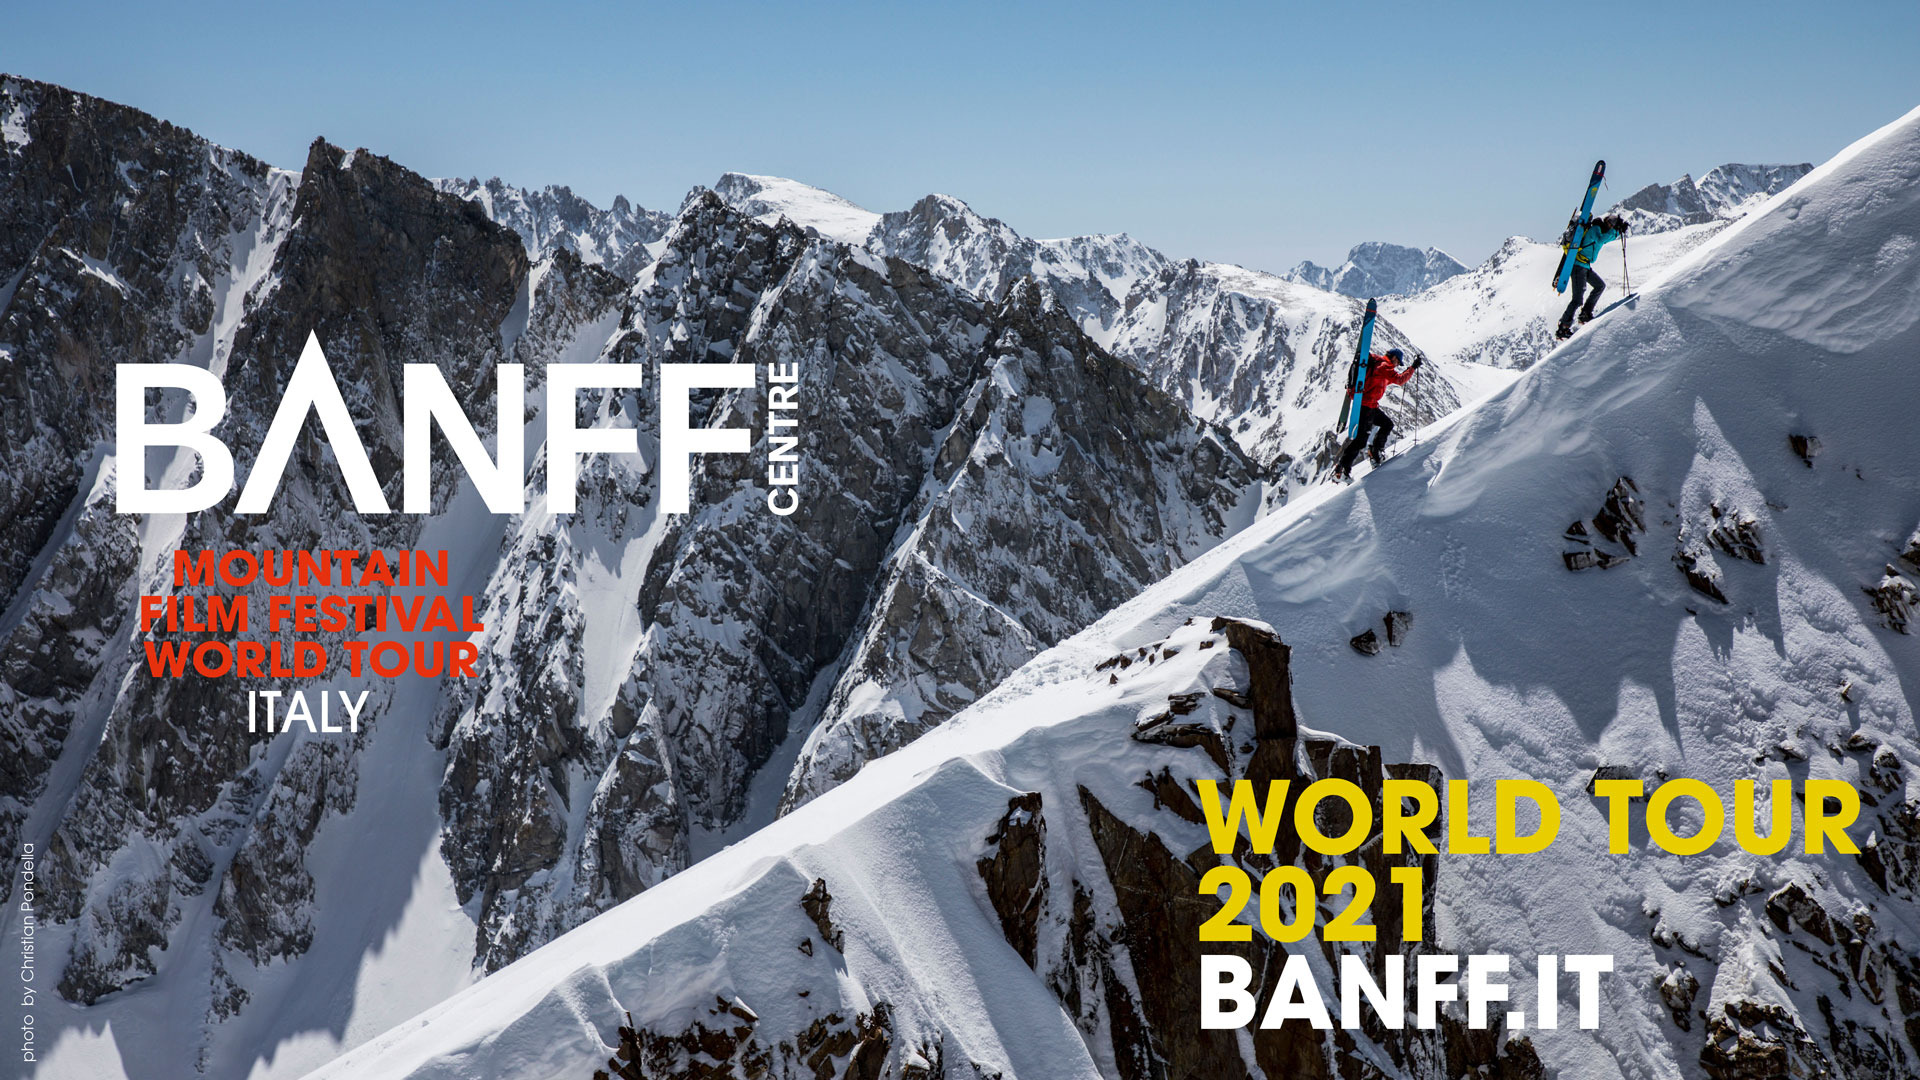 BANFF CENTRE MOUNTAIN FILM FESTIVAL WORLD TOUR 2021